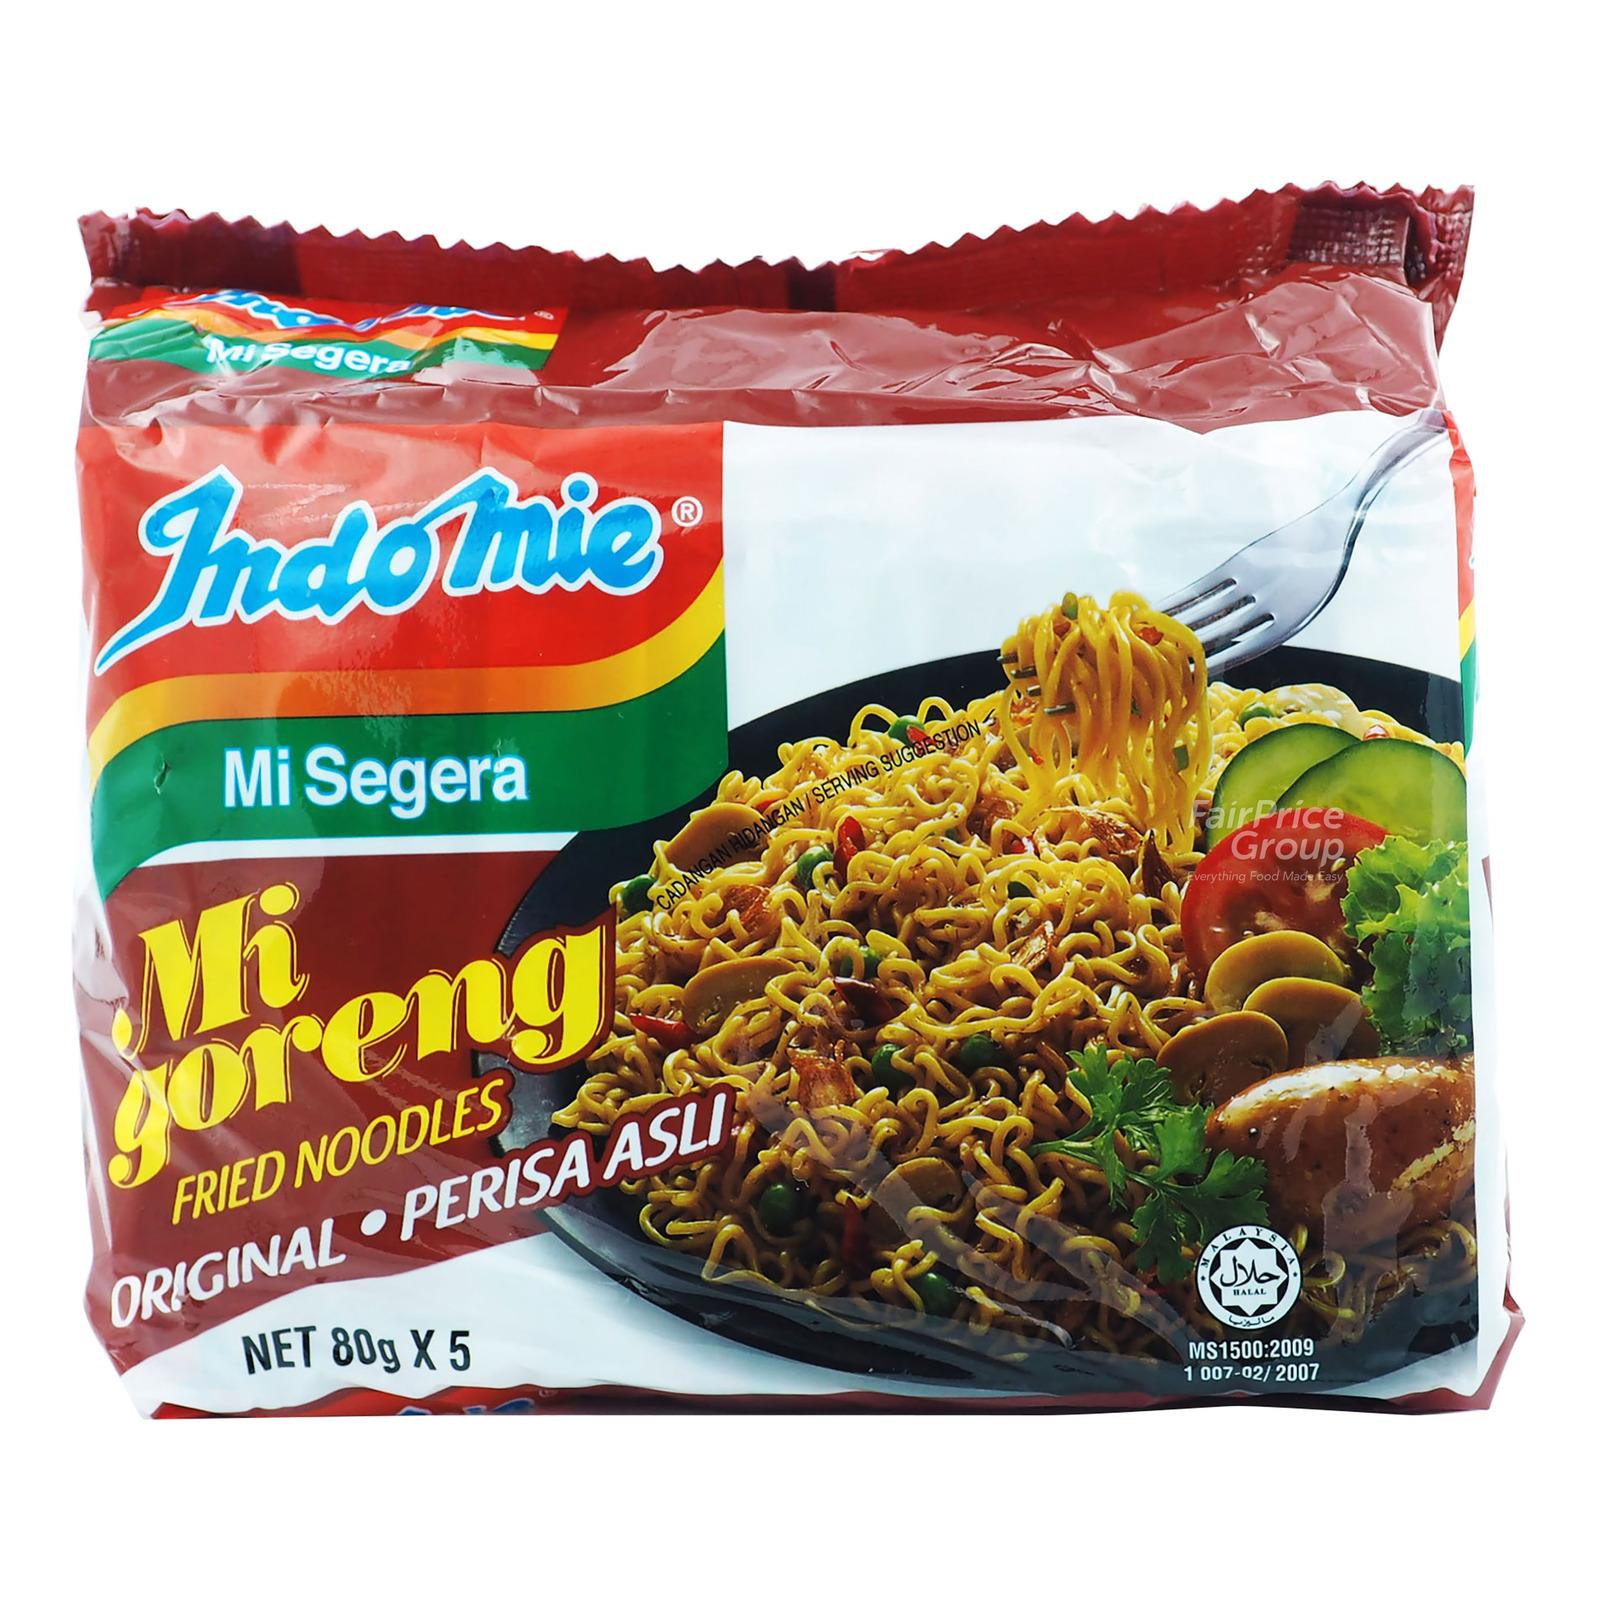 Indomie Mi Goreng Instant Noodles - Original